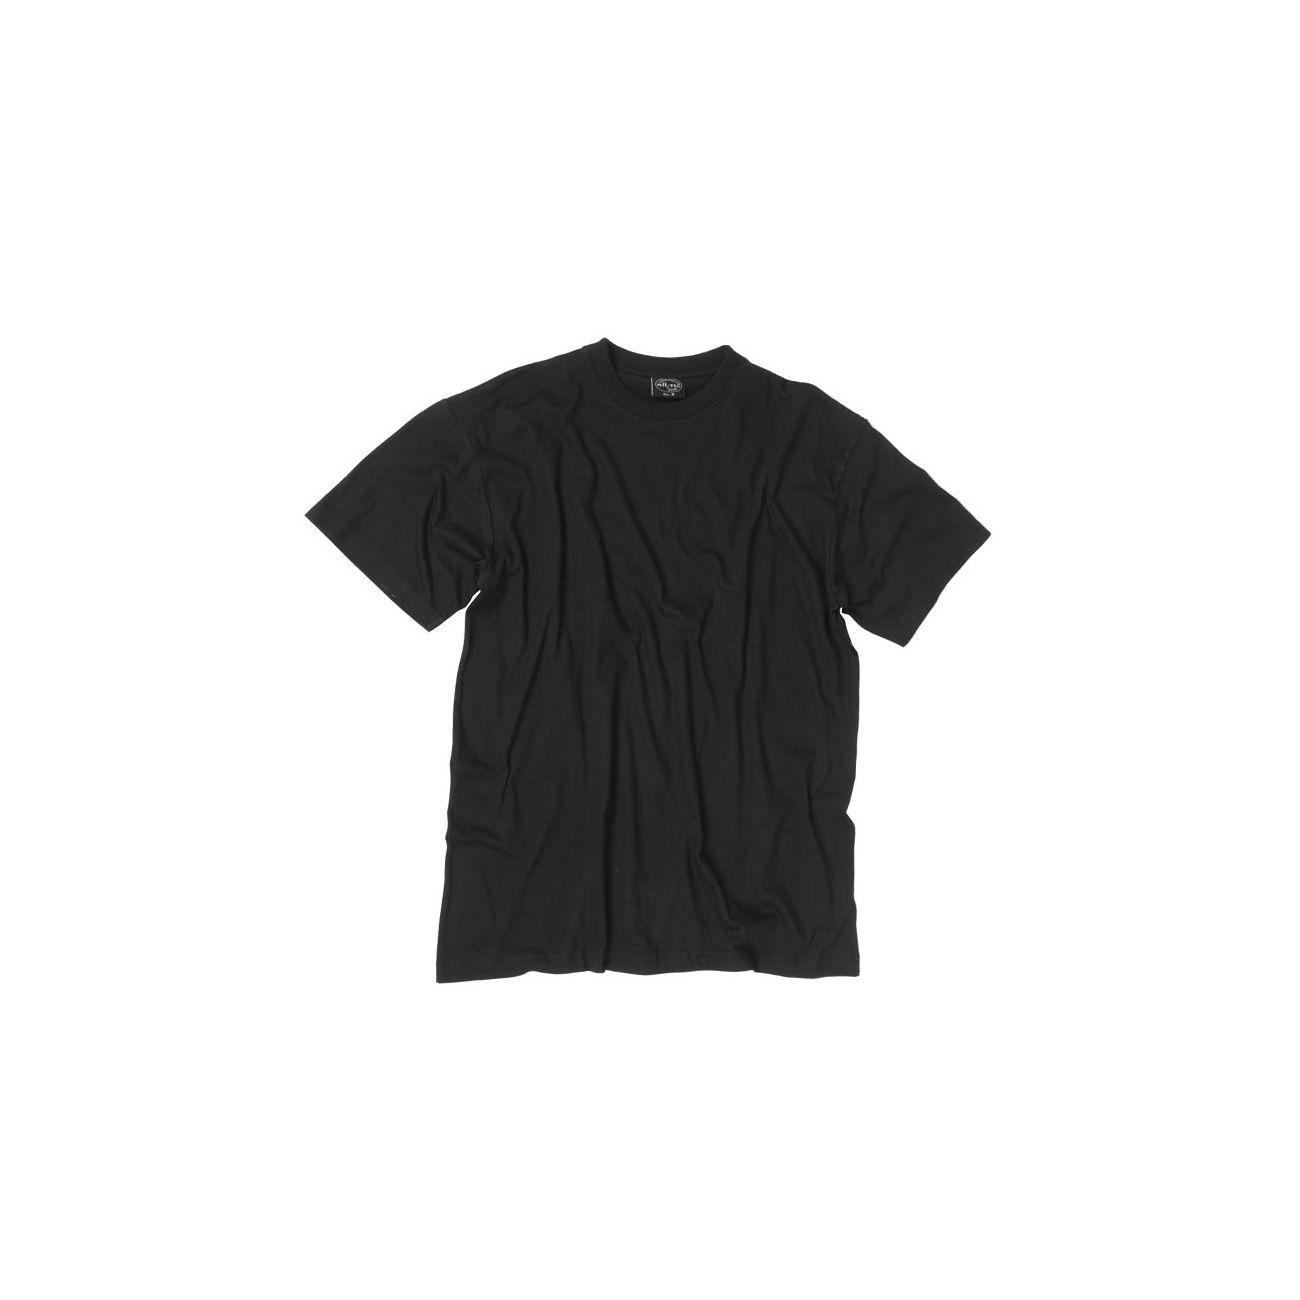 5259f20adabba7 T-Shirt schwarz günstig kaufen - Kotte   Zeller